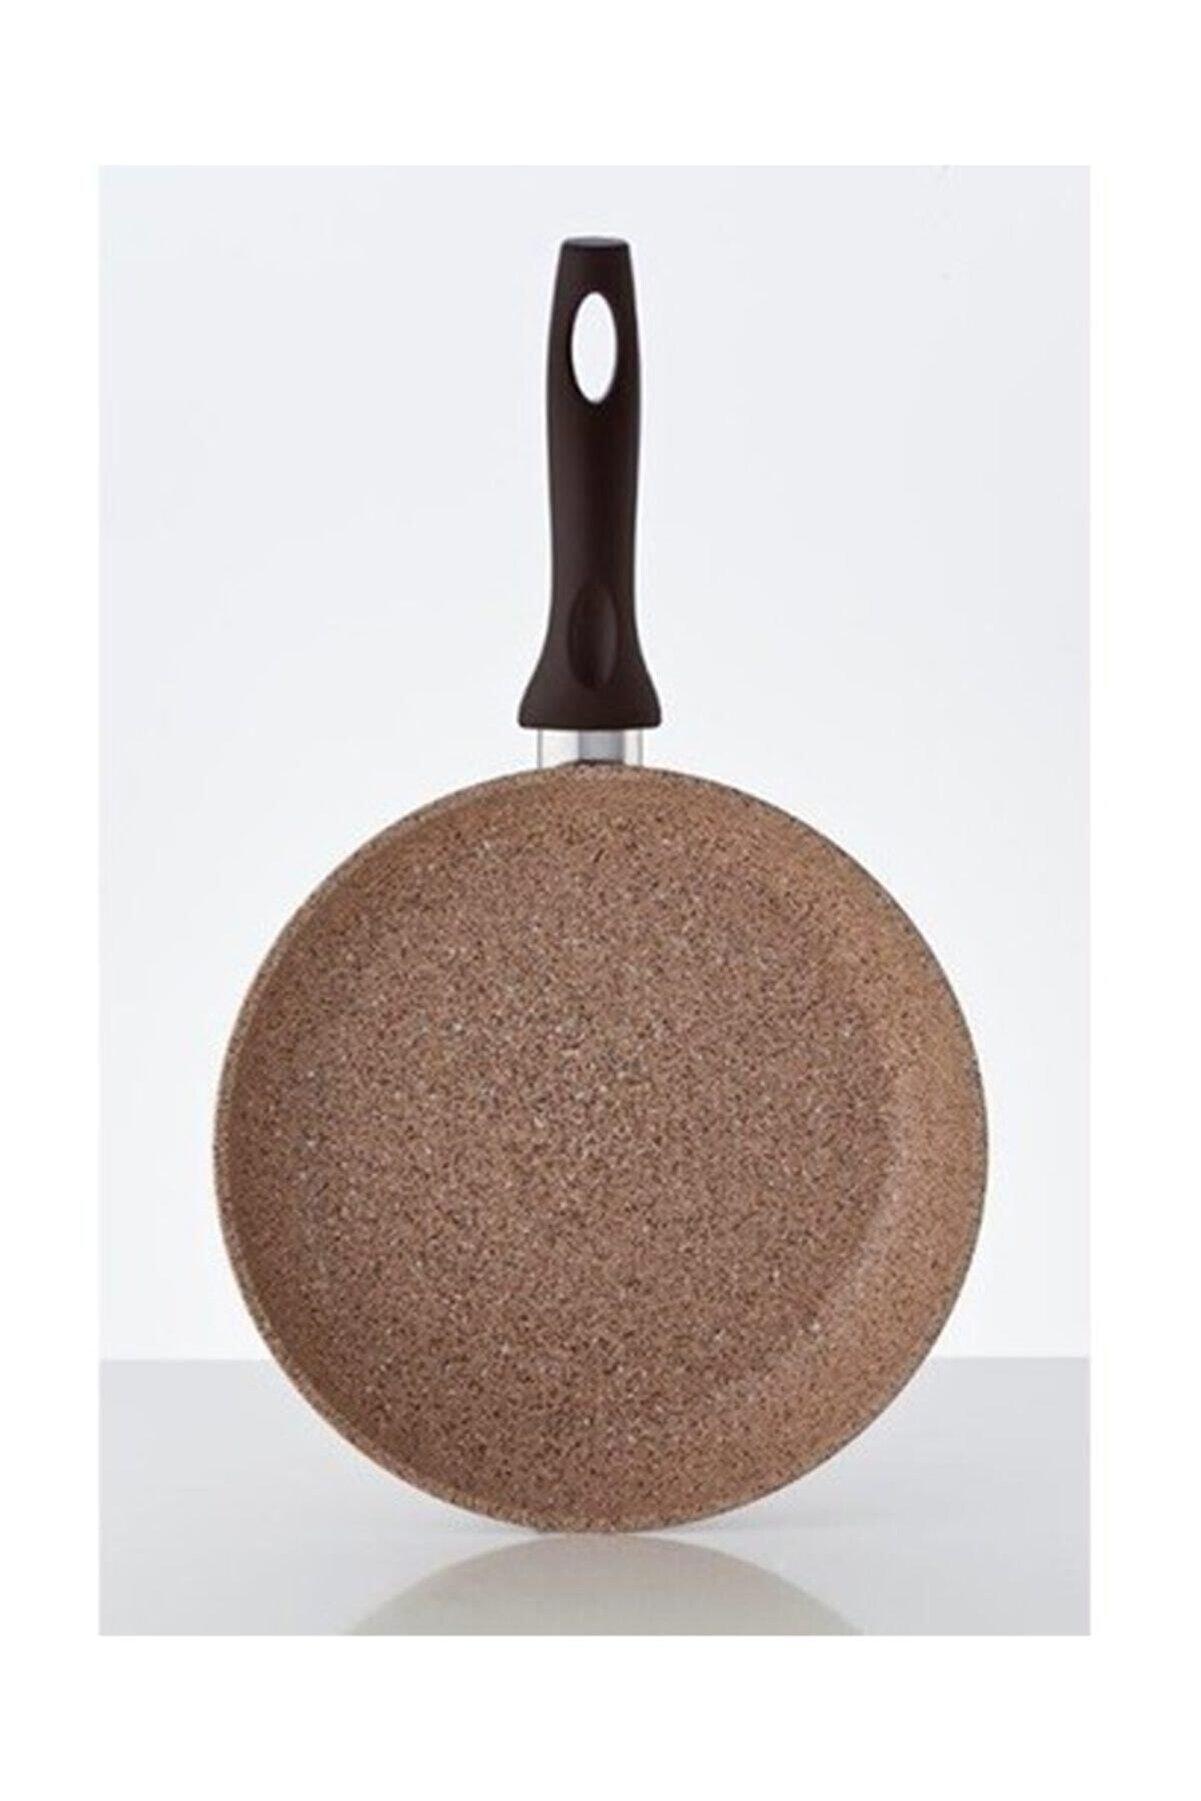 Falez Creamy Ilag Granitech 26 Cm Tava